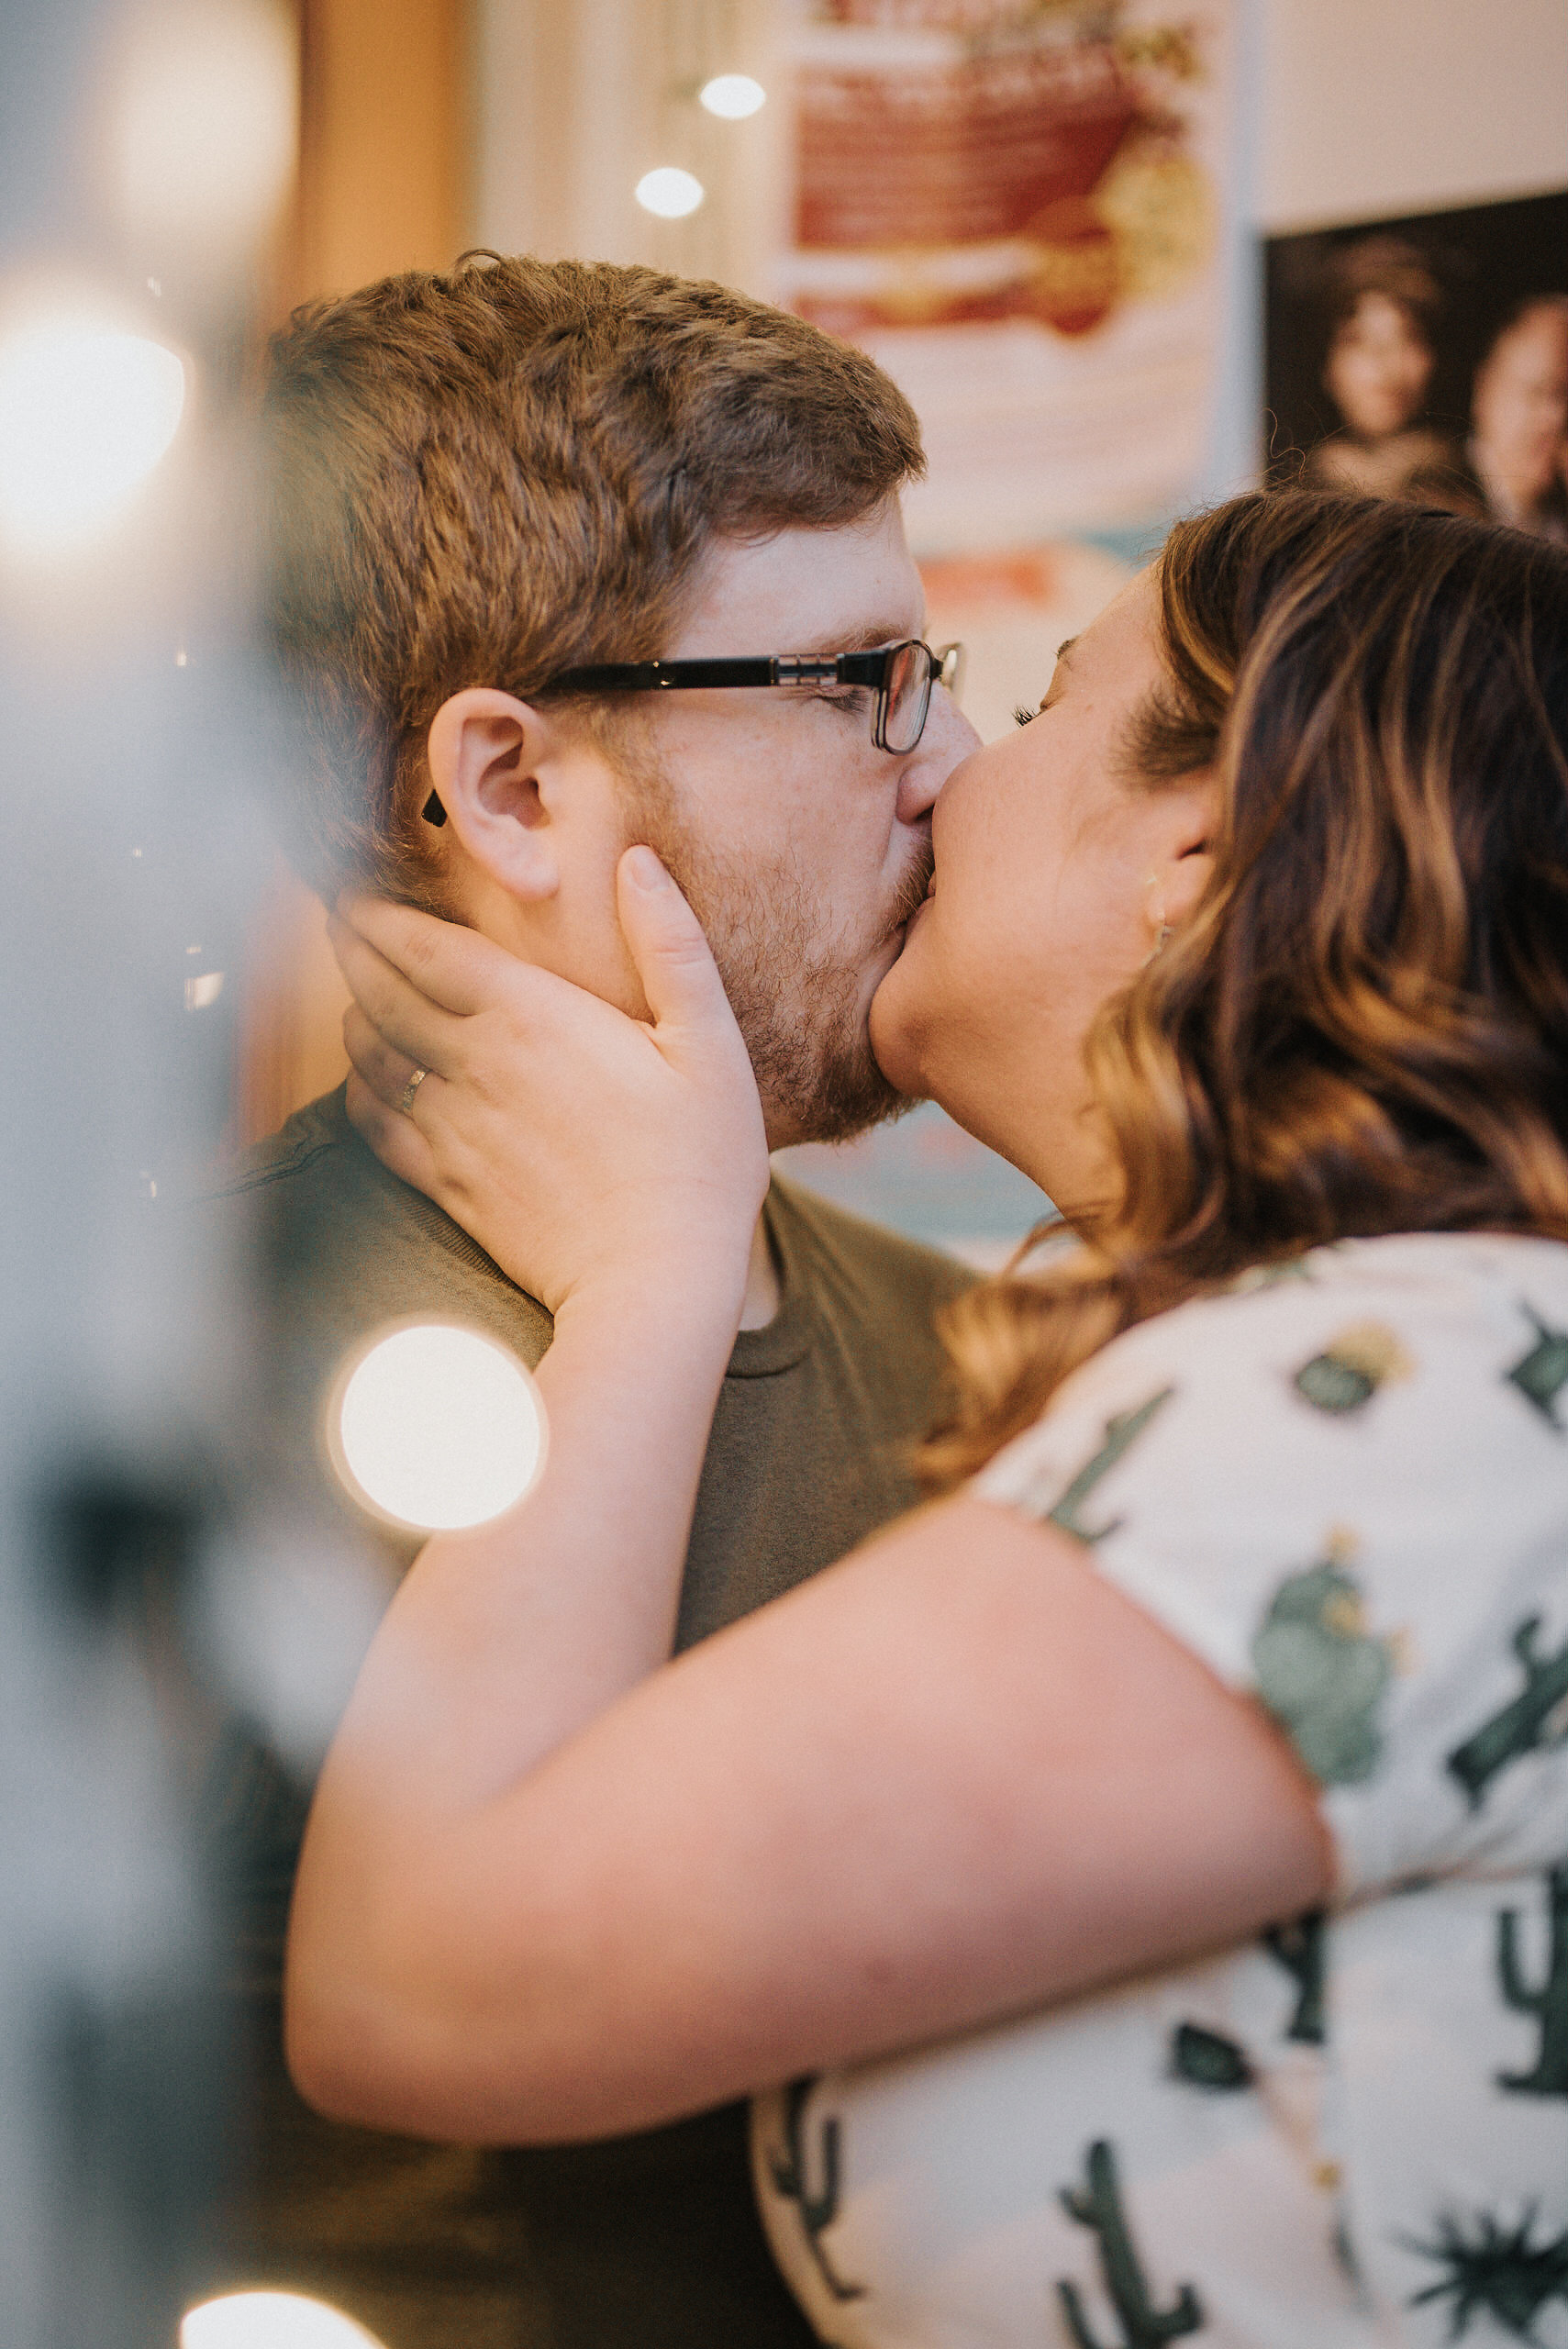 oman kissing man on doorstep